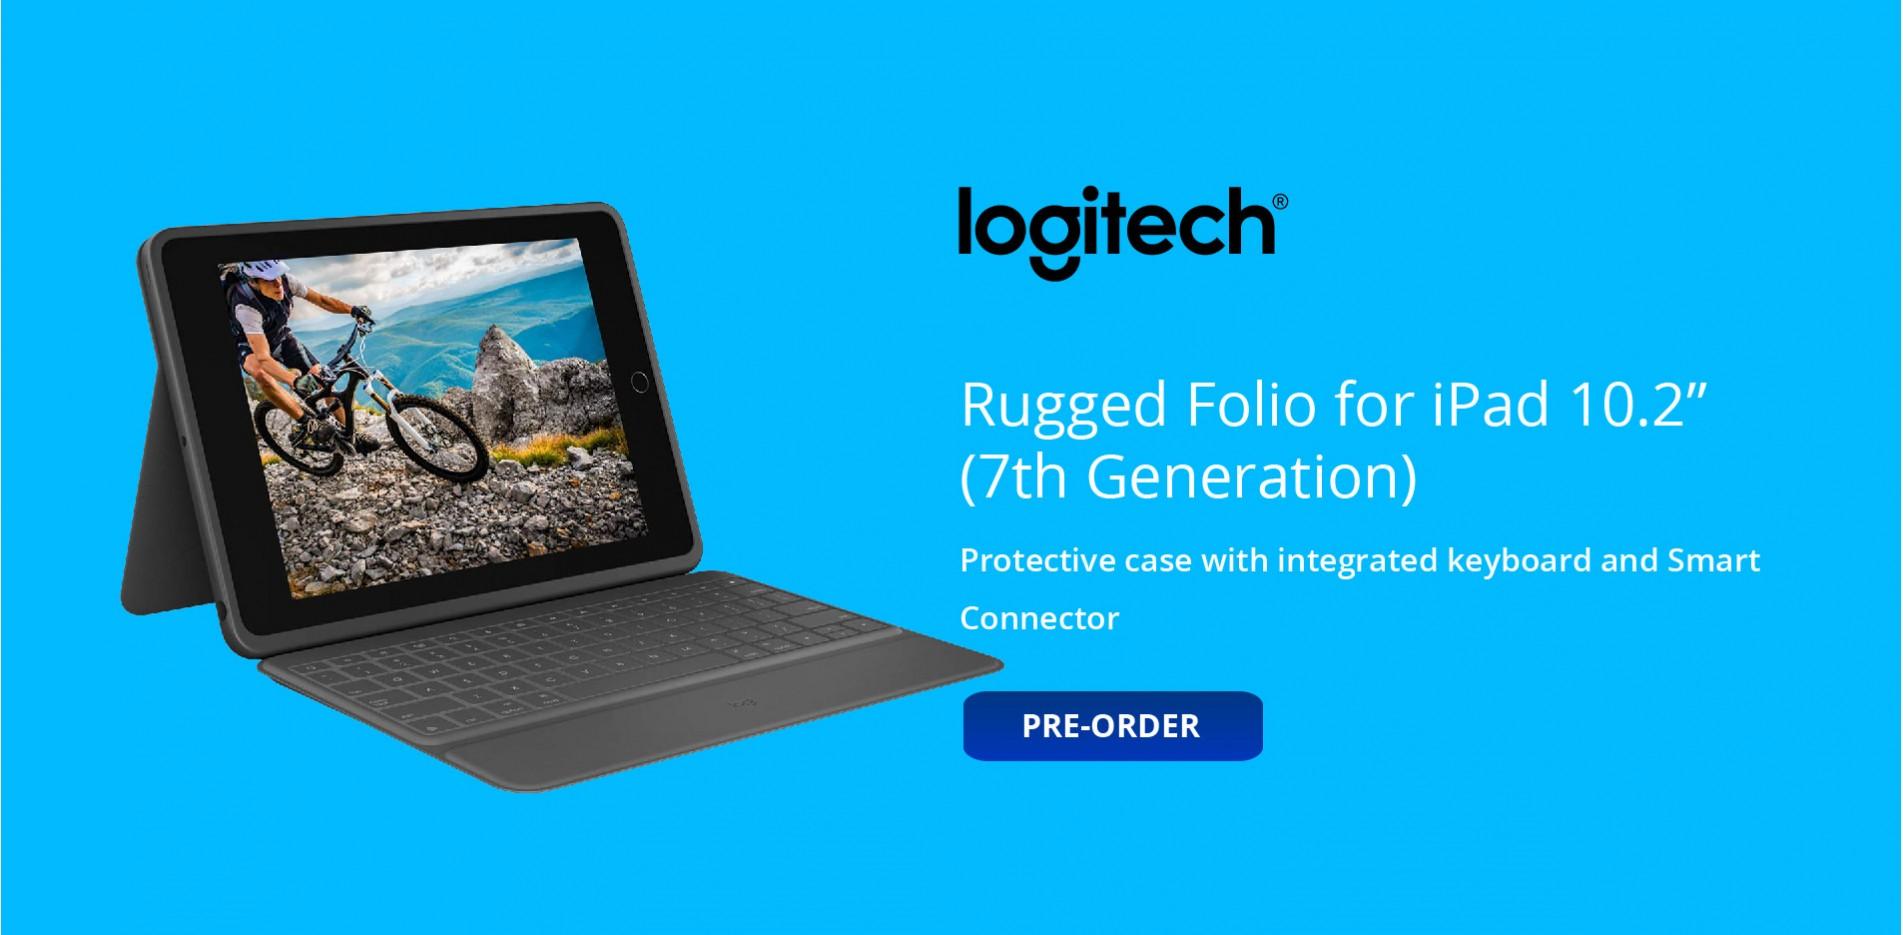 Logitech Rugged Folio